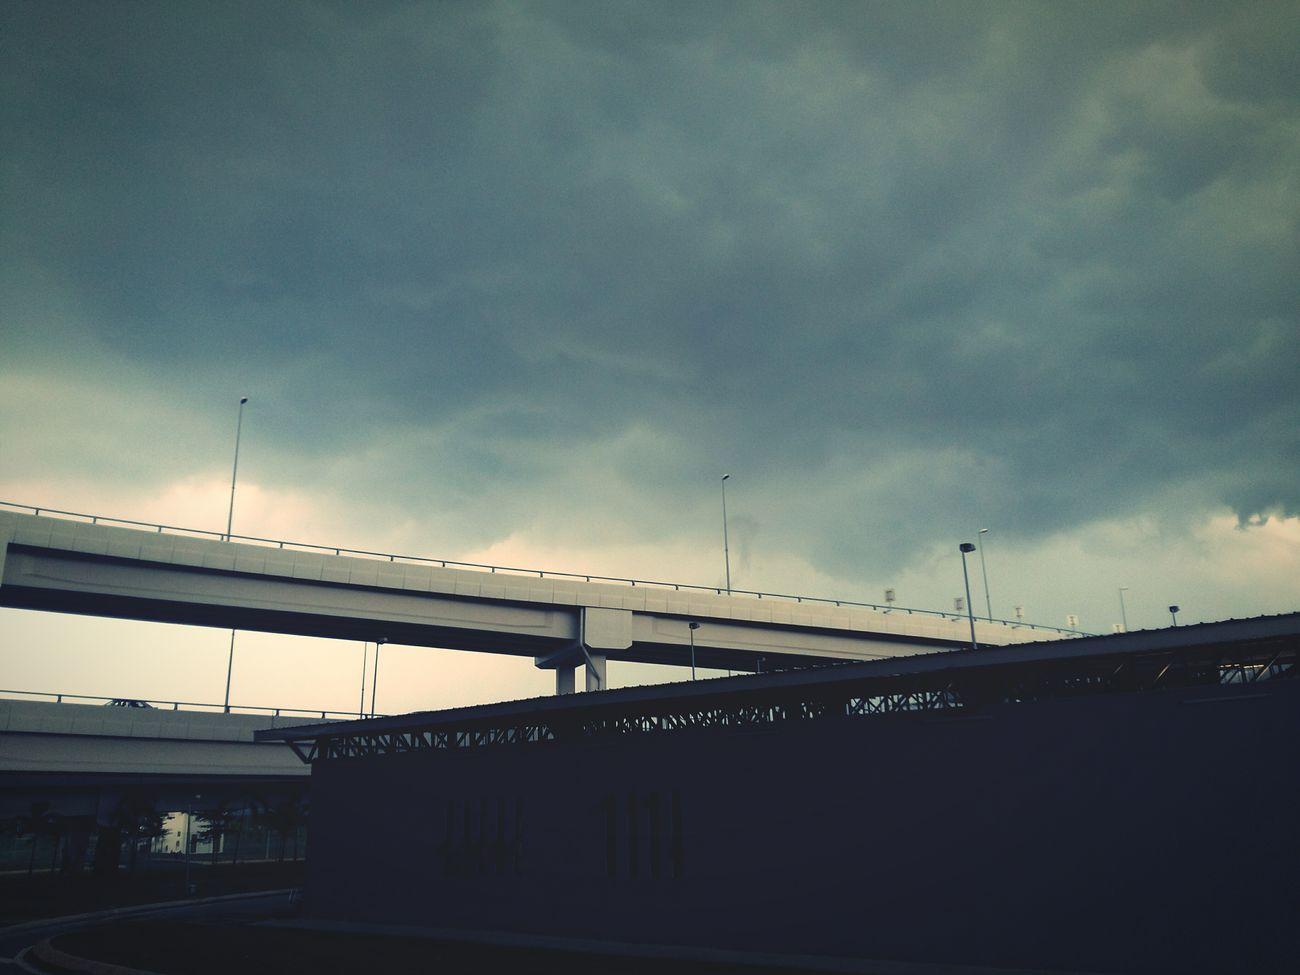 cloudy rain , havy rain